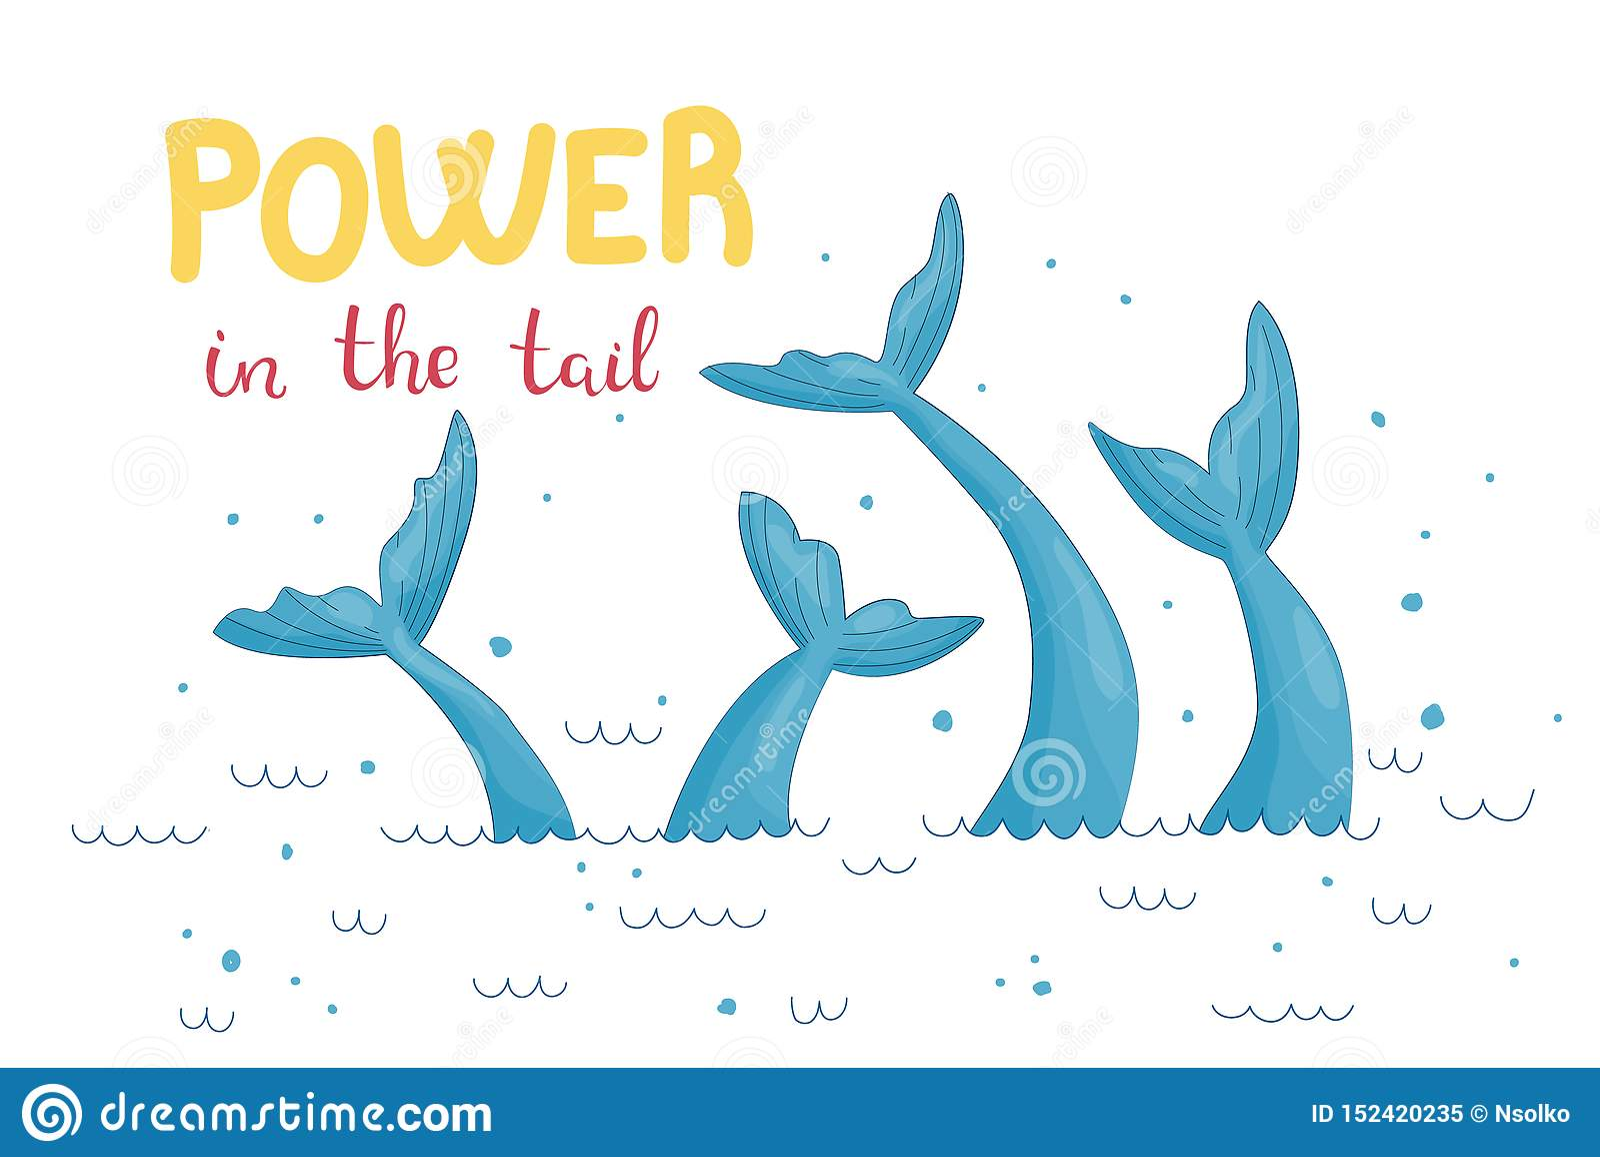 Mermaid tail graphic illustration